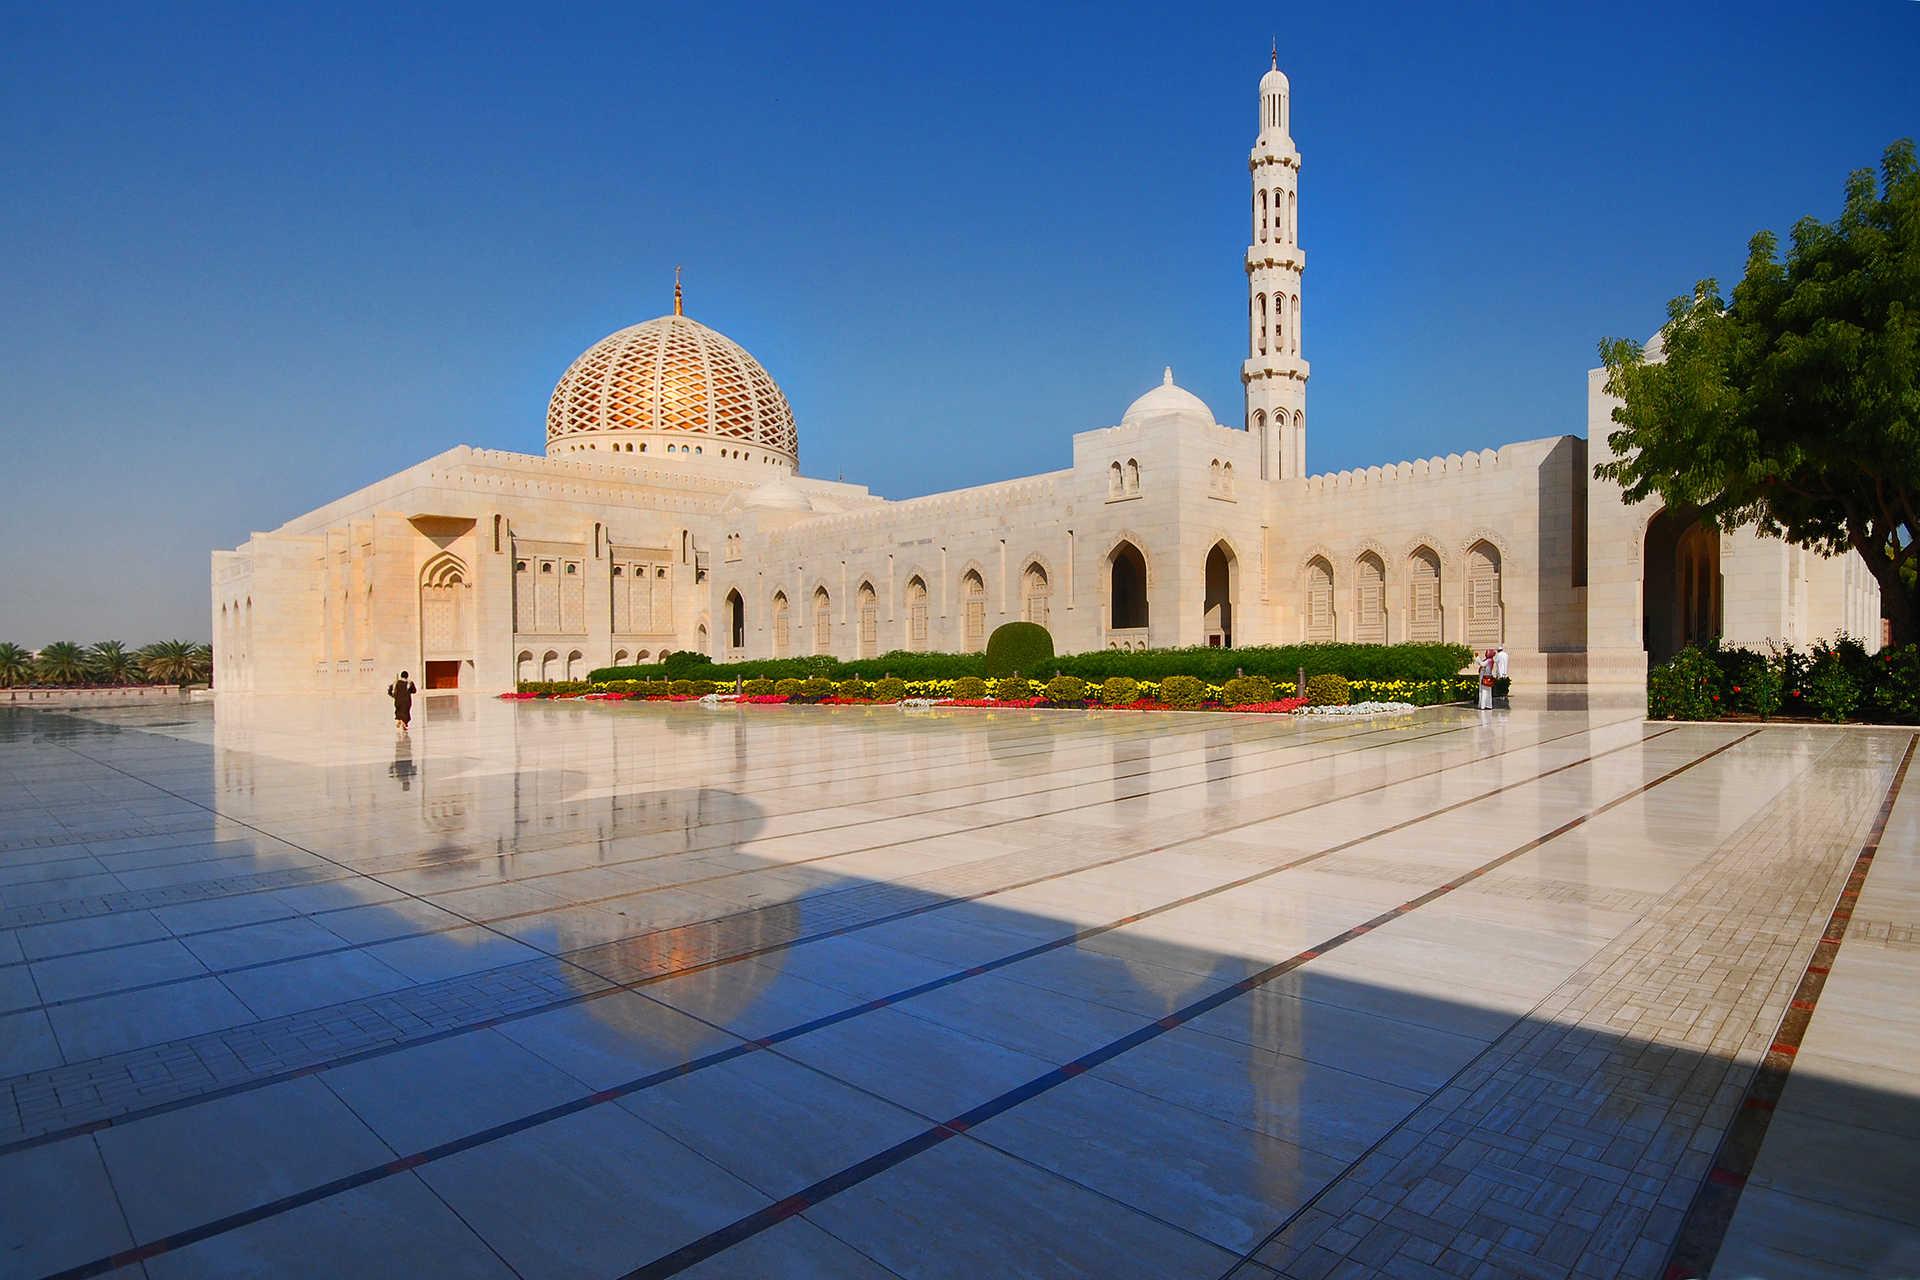 Mosquée du Sultan Qaboos, Mascate, Oman